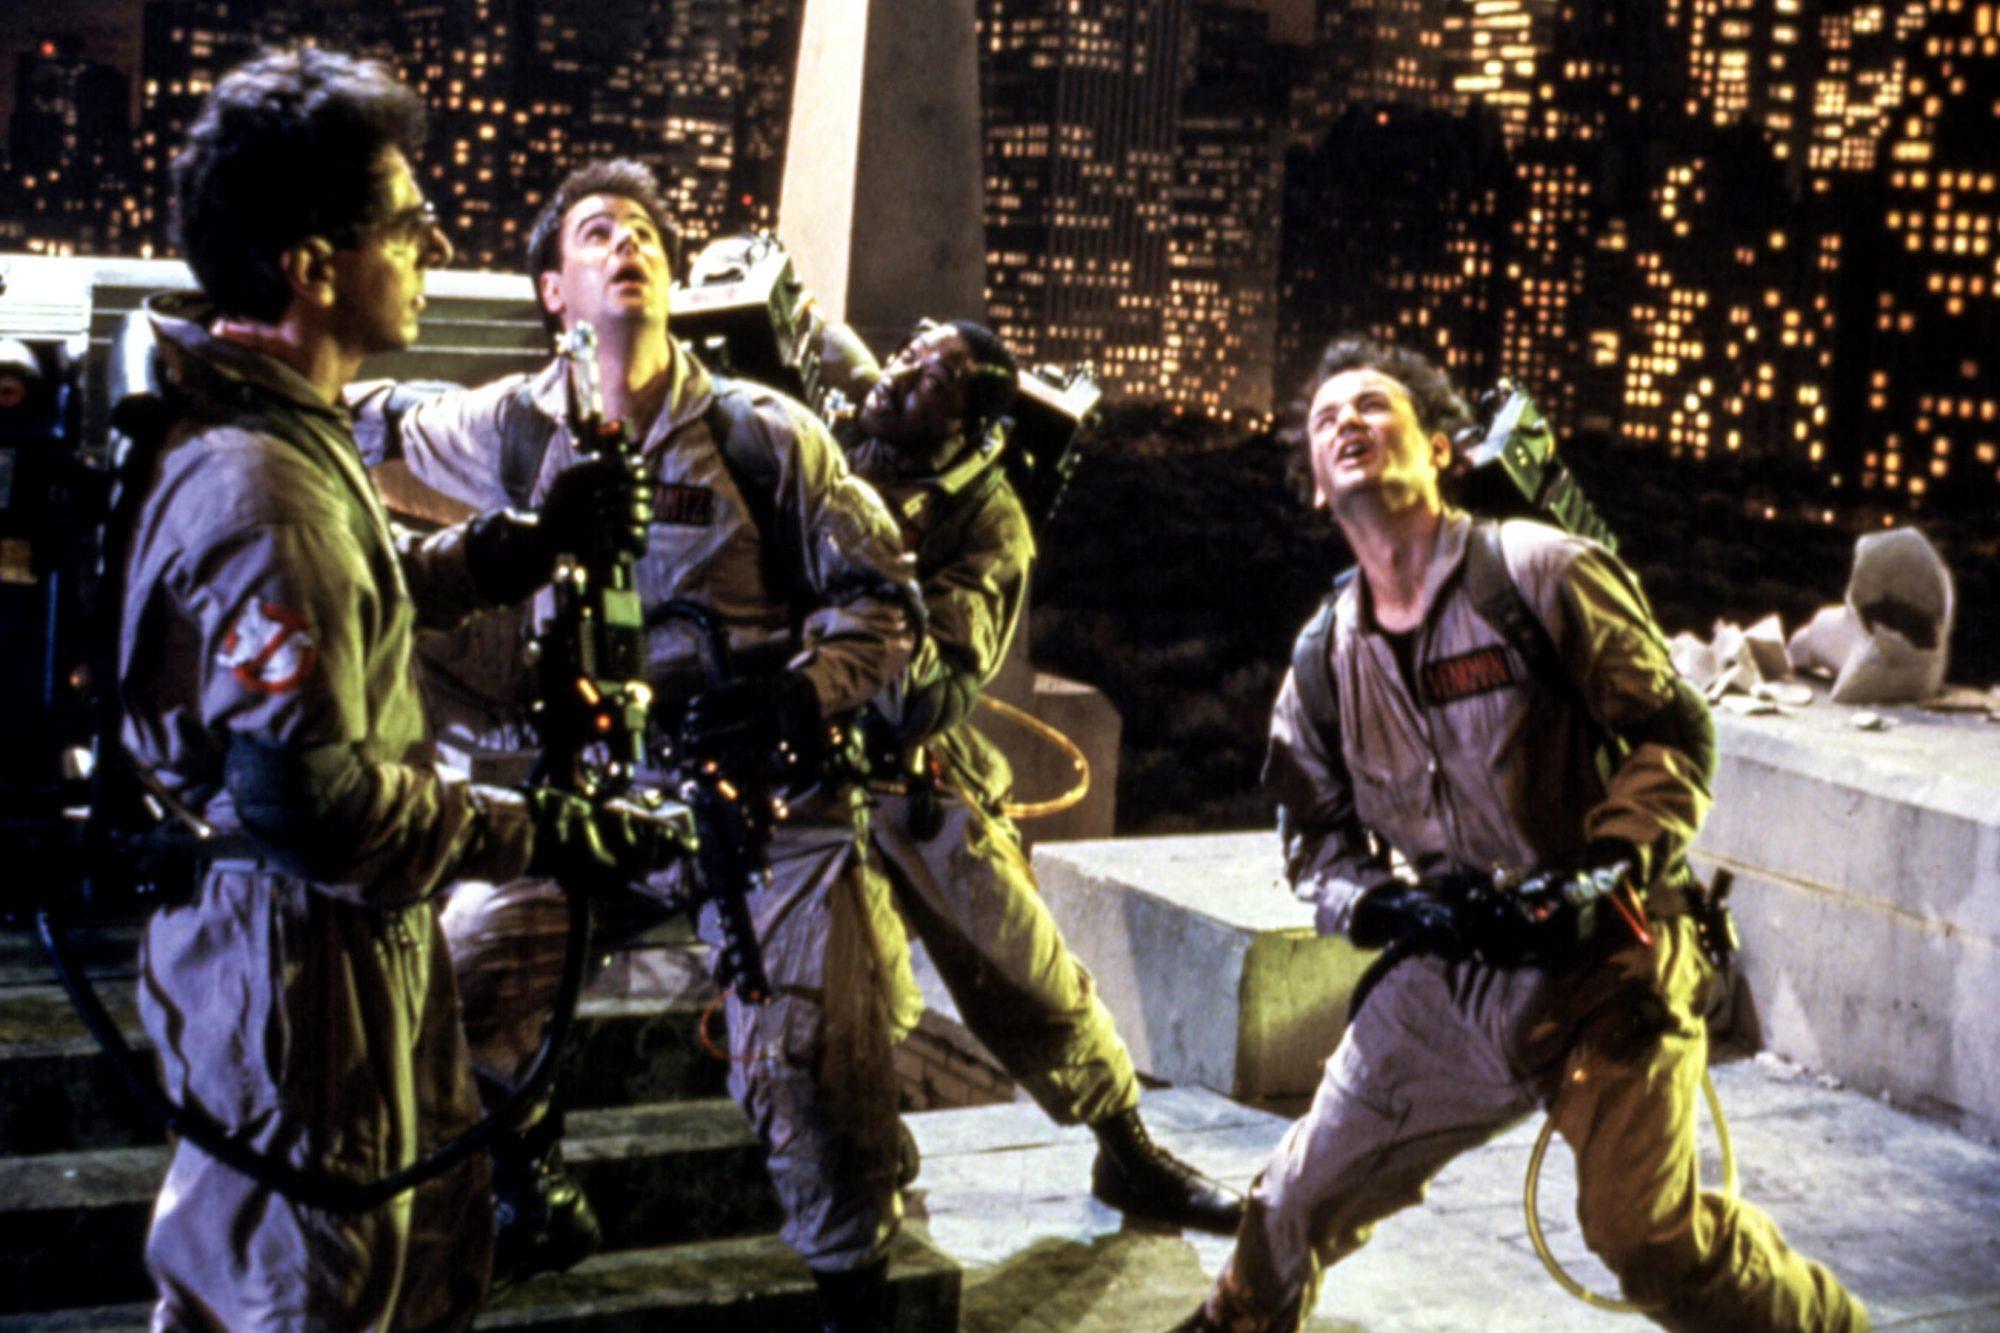 GHOSTBUSTERS, Harold Ramis, Dan Aykroyd, Ernie Hudson, Bill Murray, 1984